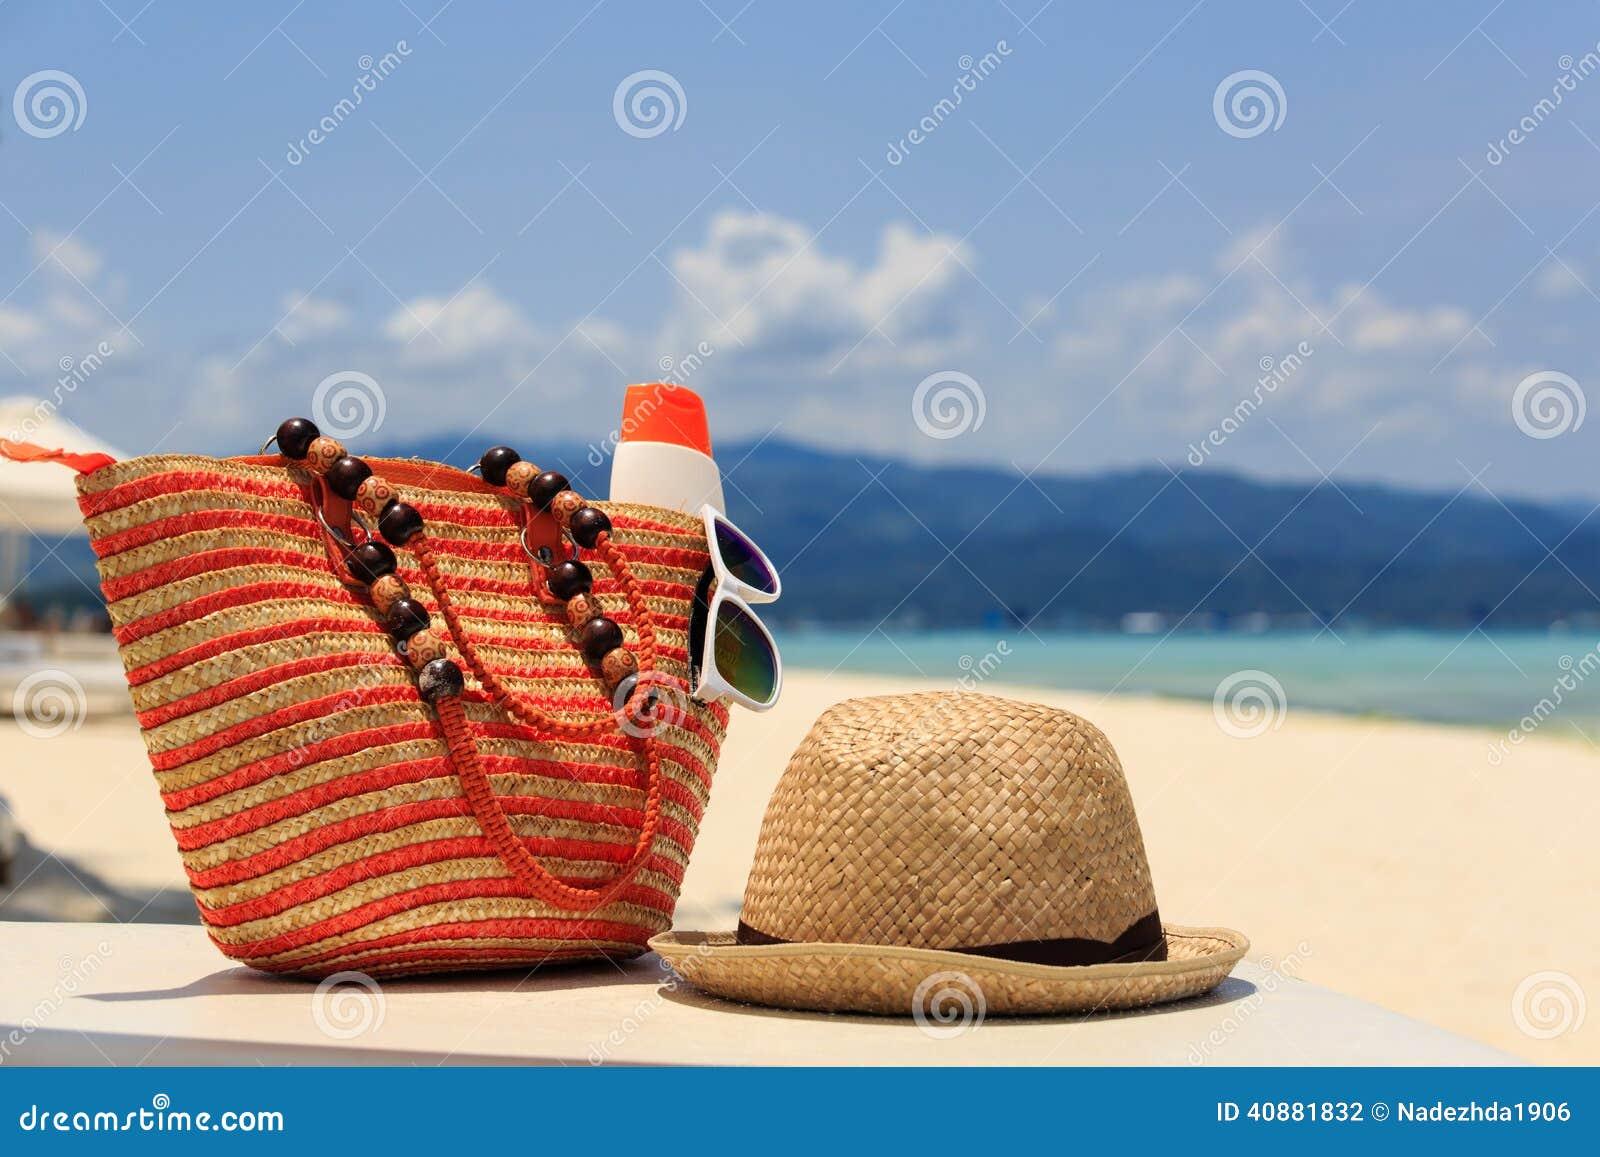 Hat, bag, sun glasses and flip flops on tropical beach